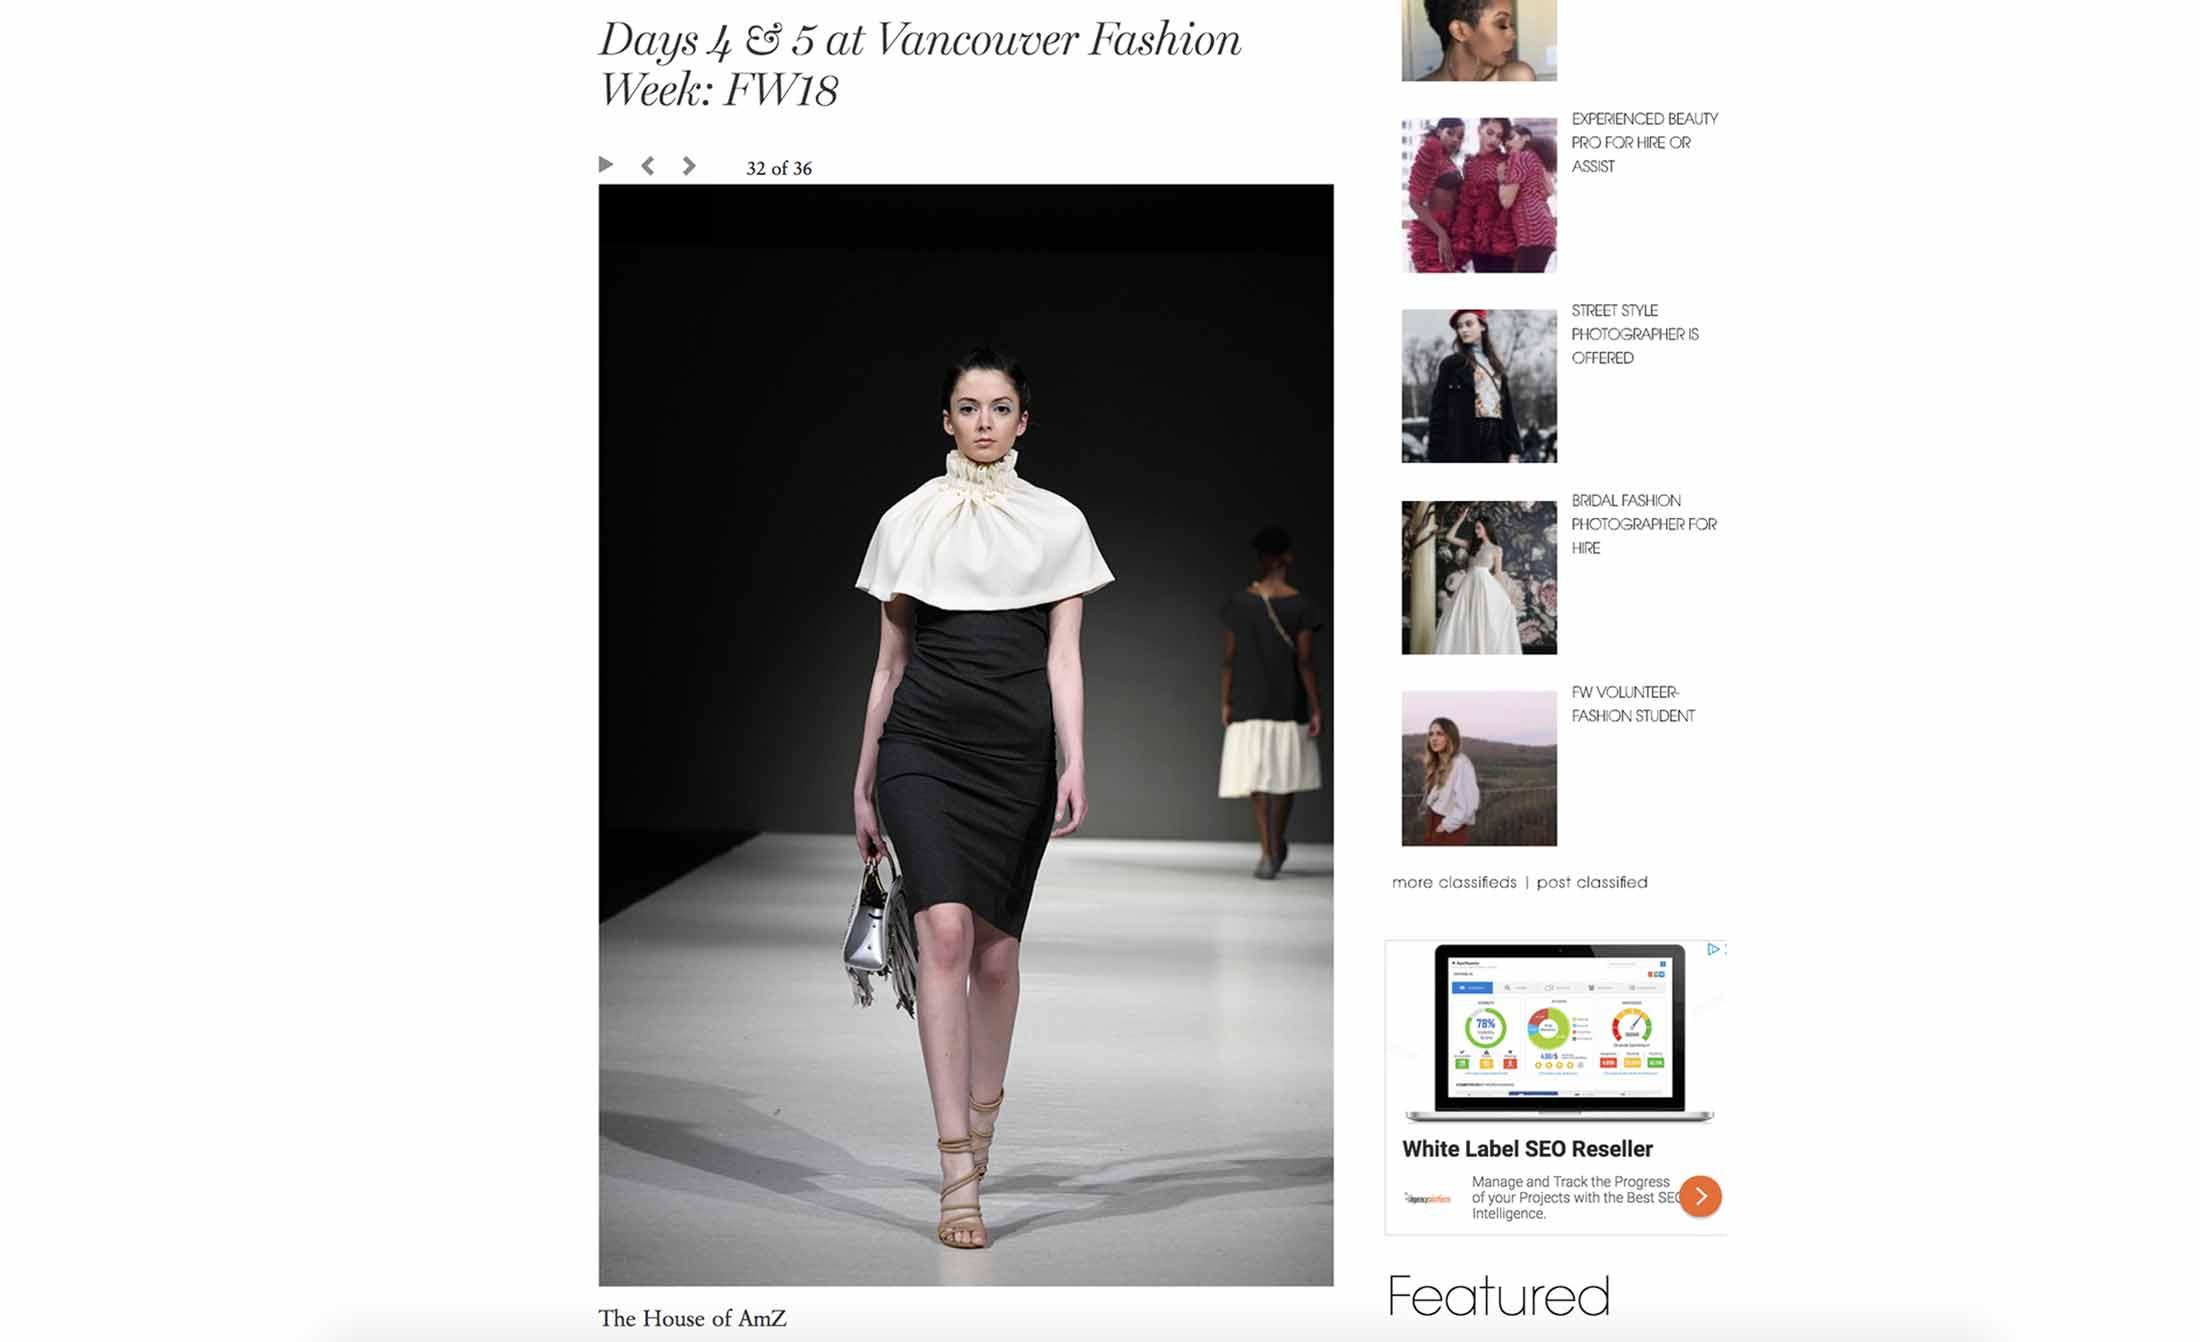 - Days 4 & 5 at Vancouver Fashion Week Fashion Week Online